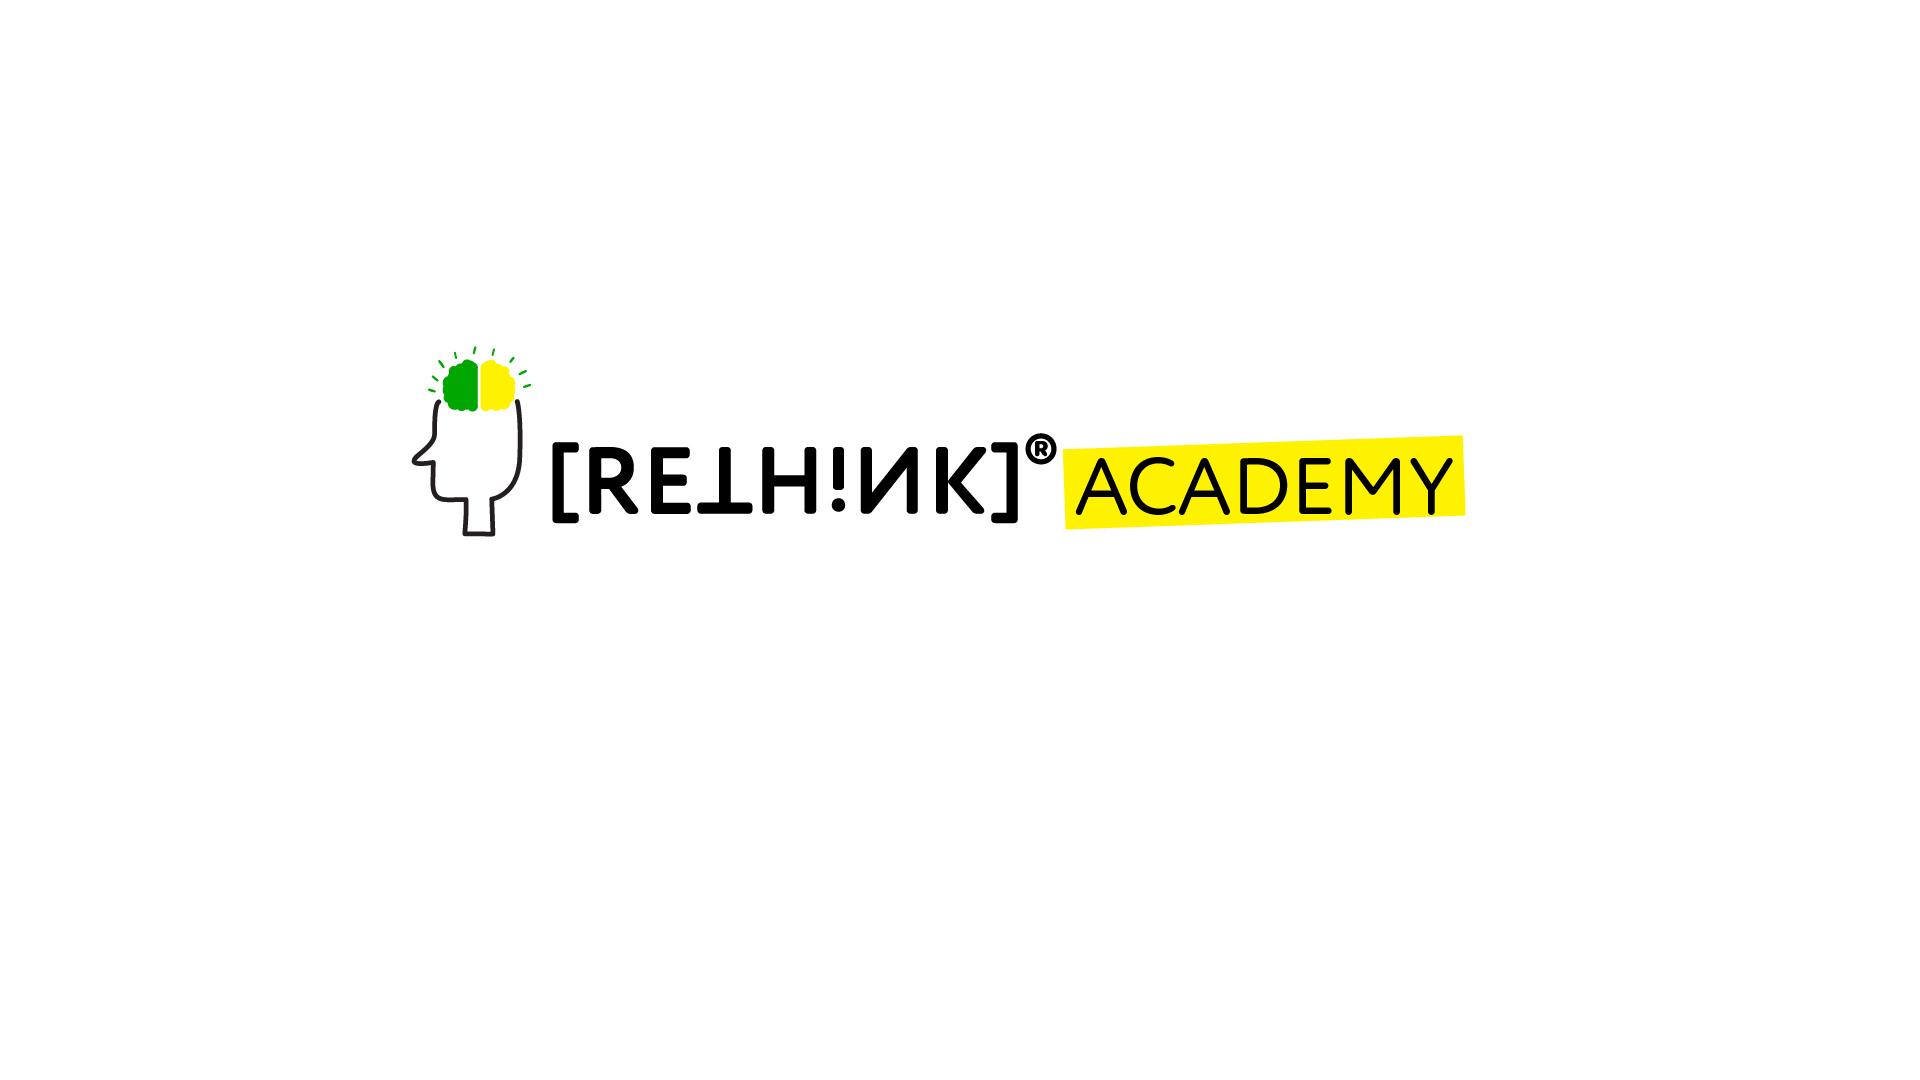 logo [RETHINK]™ Academy